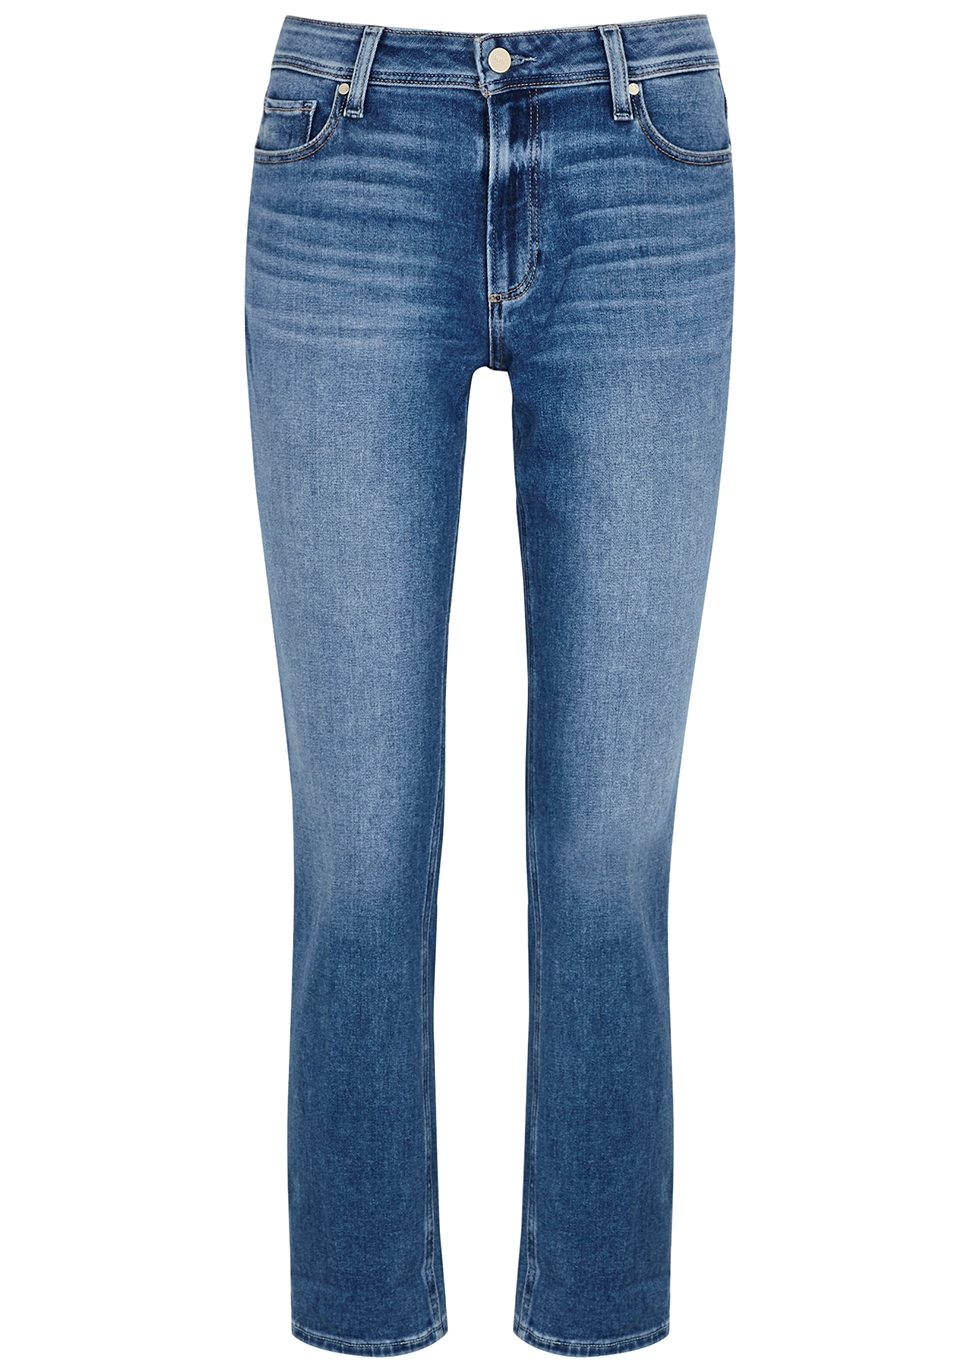 Brigitte Transcend blue slim boyfriend jeans